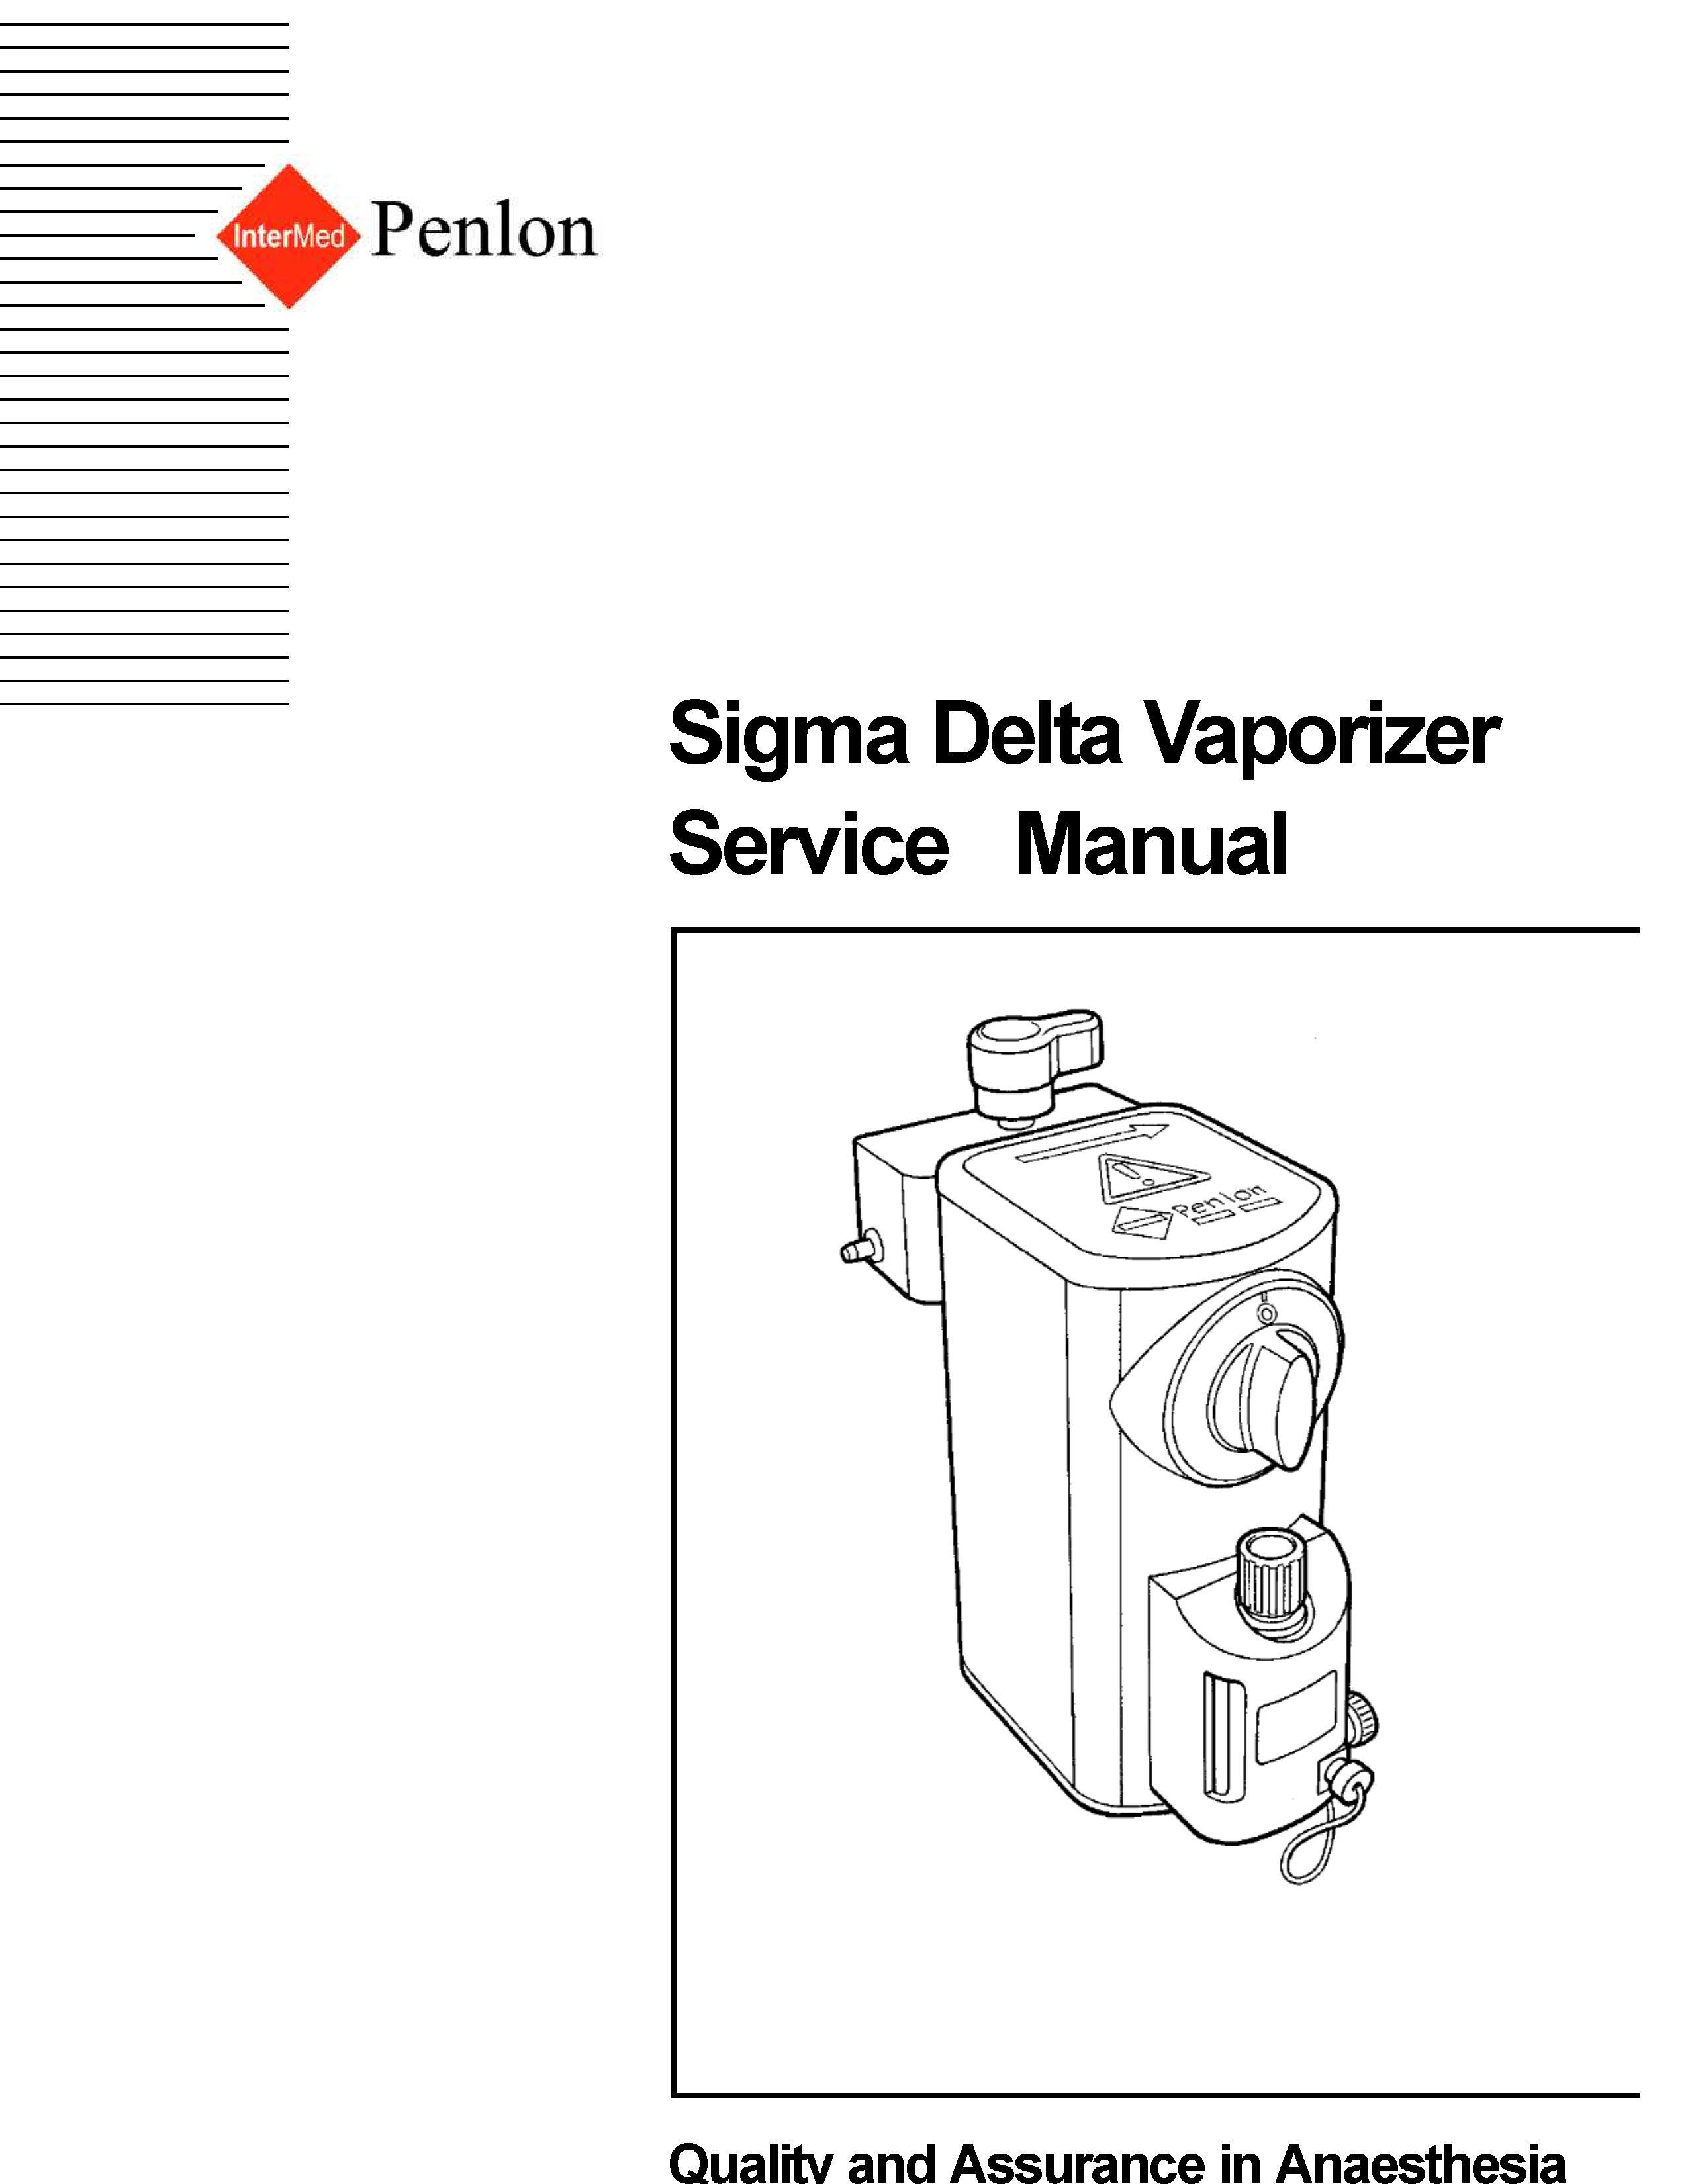 Penlon Sigma Delta Service manual